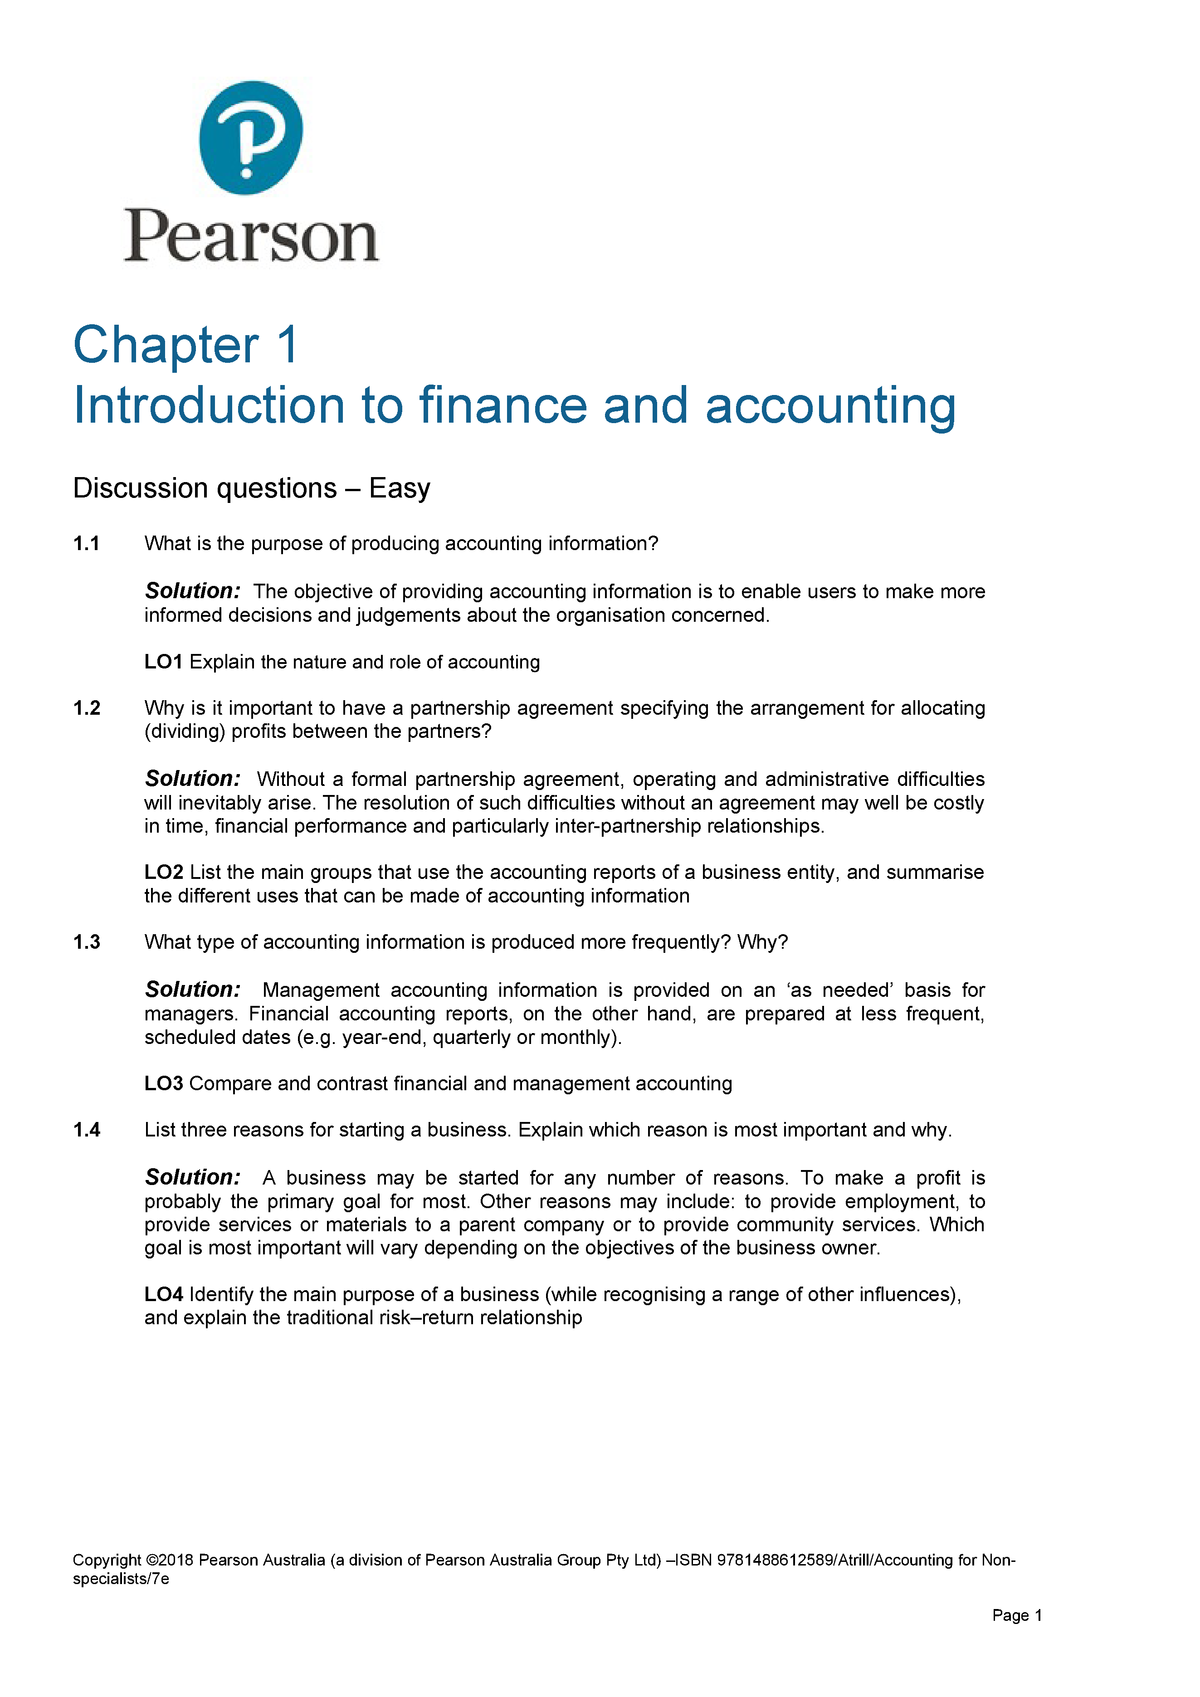 ATRI AFNS 7E SM C01 - ACCT2171 Financial Planning - RMIT